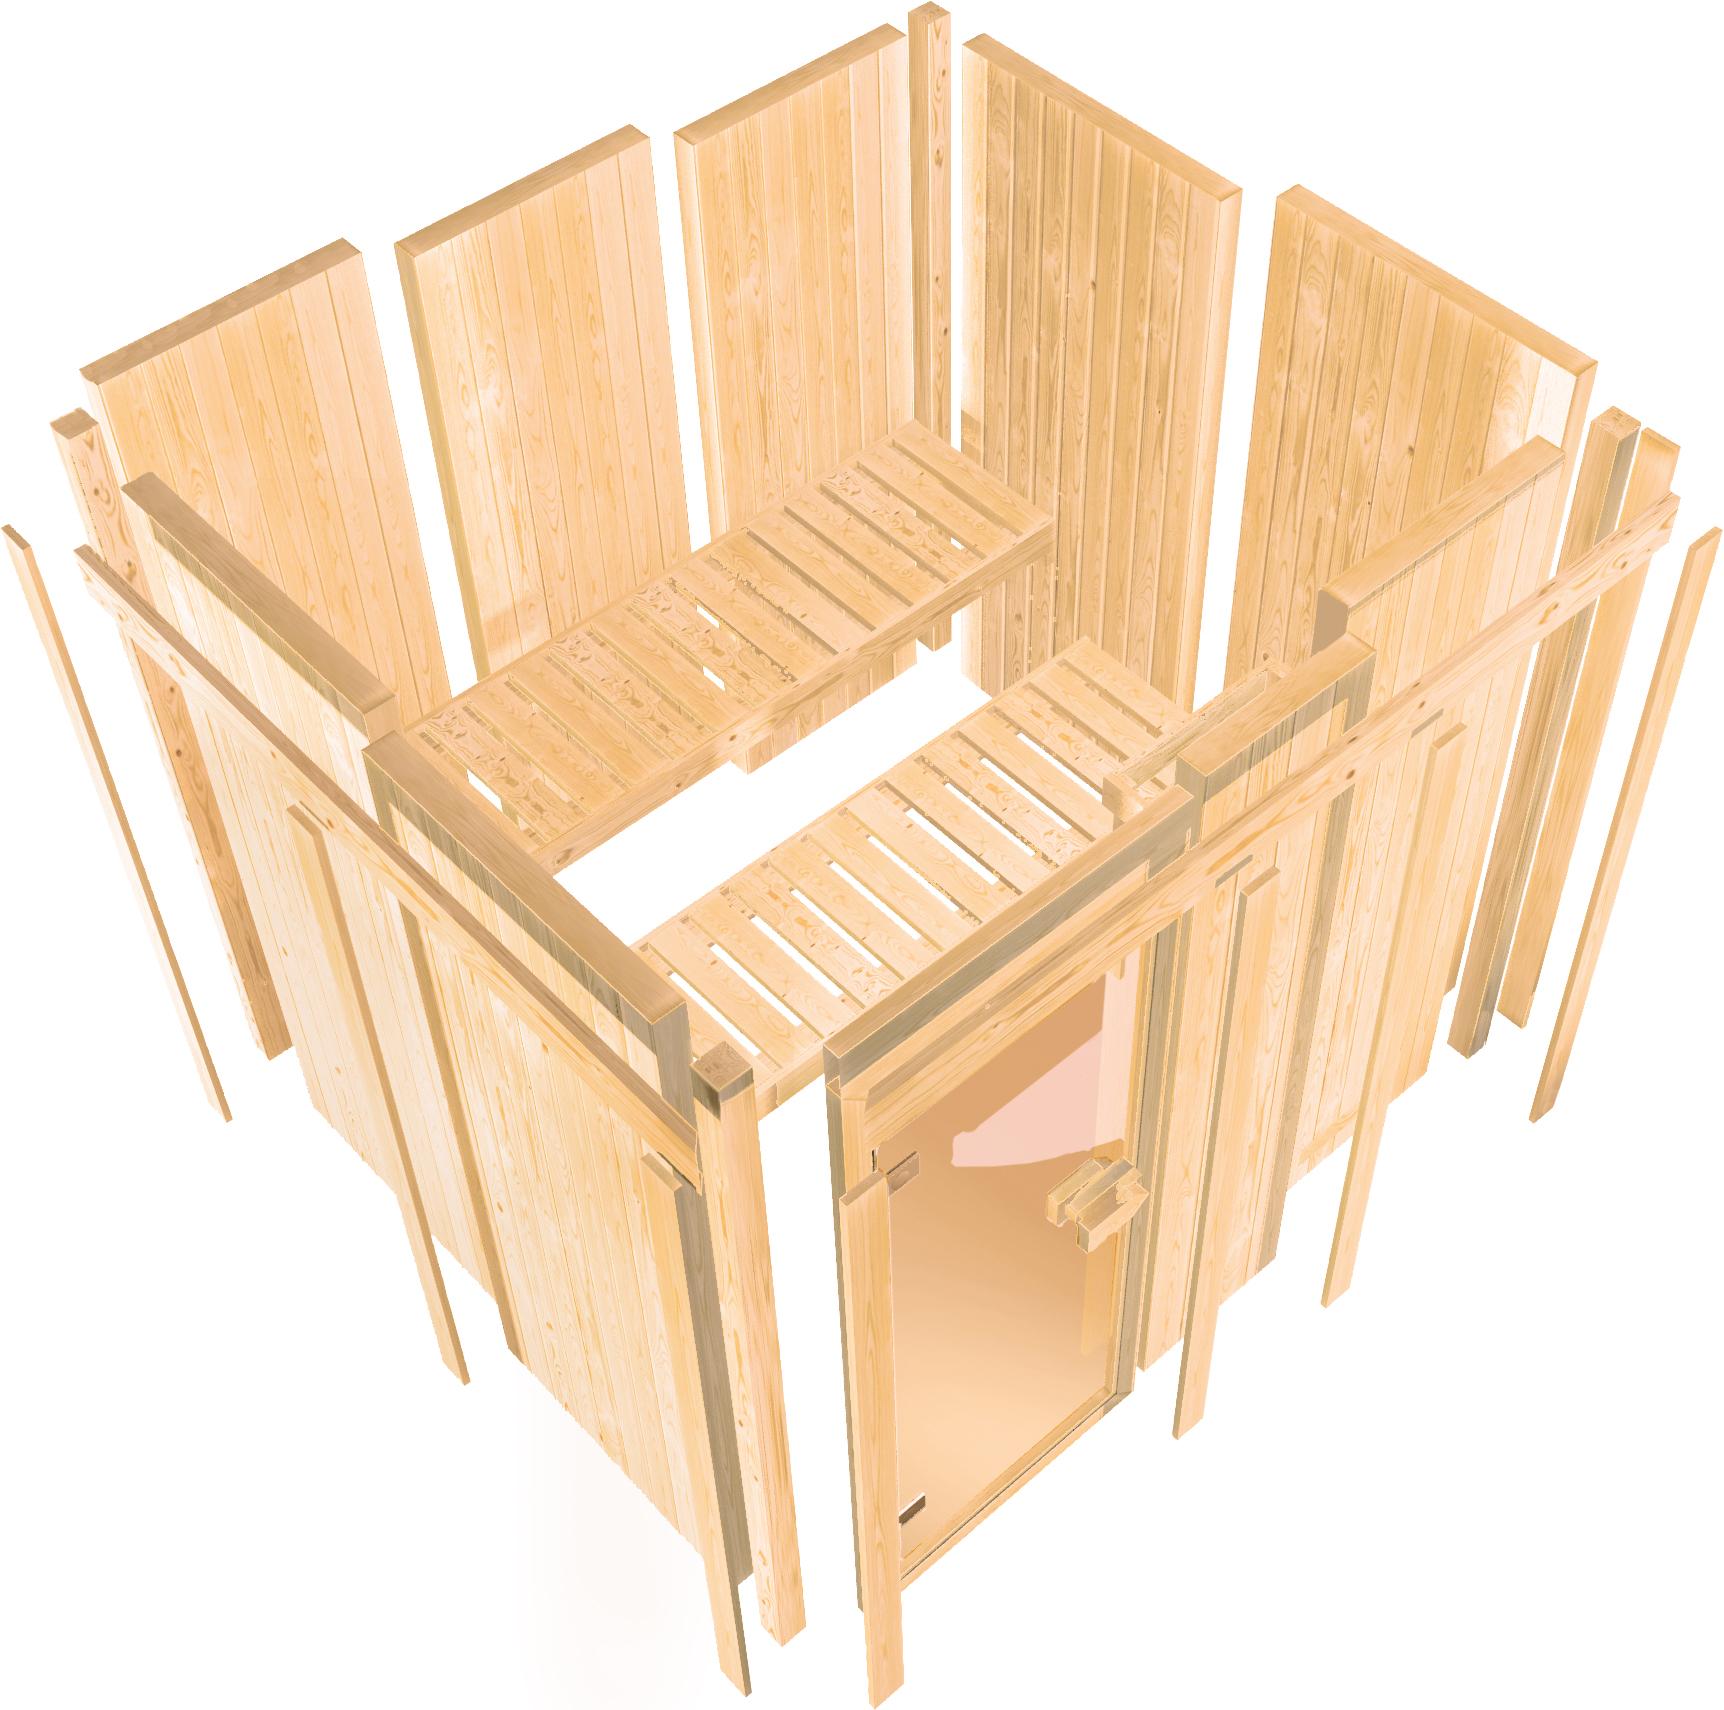 Woodfeeling Sauna Bodo 68mm Saunaofen 9kW intern Bild 2